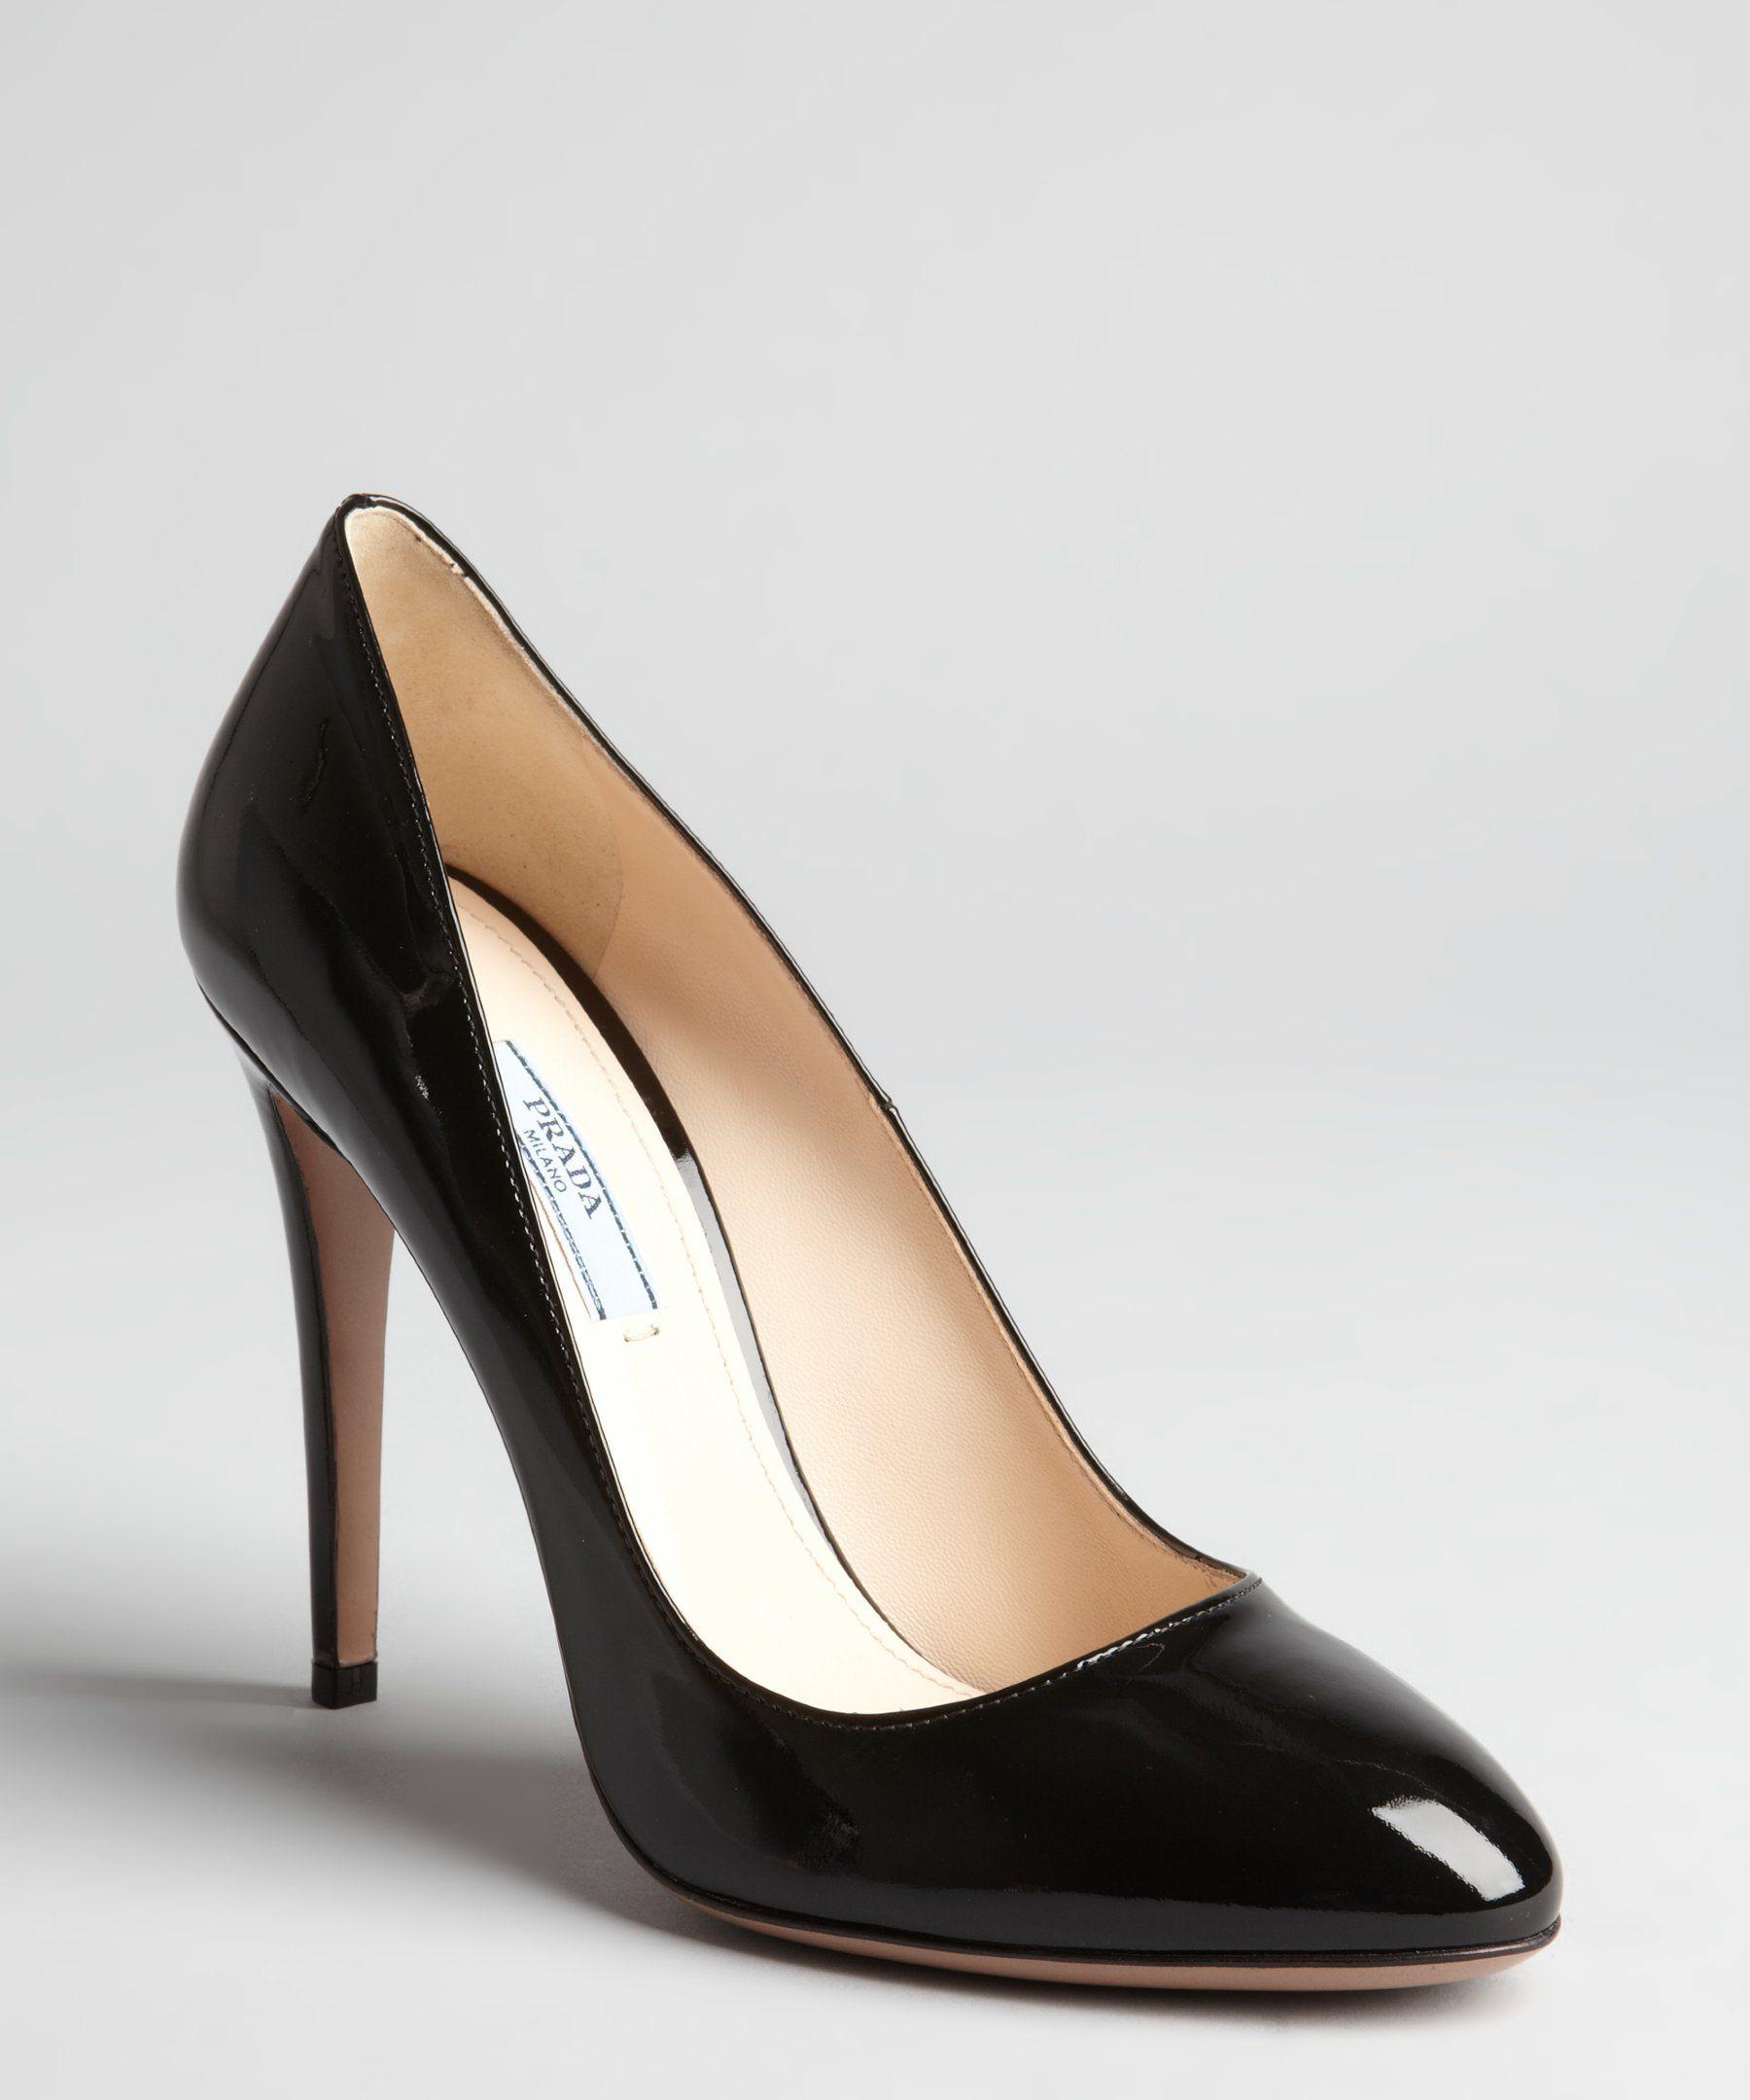 Prada black patent leather round toe